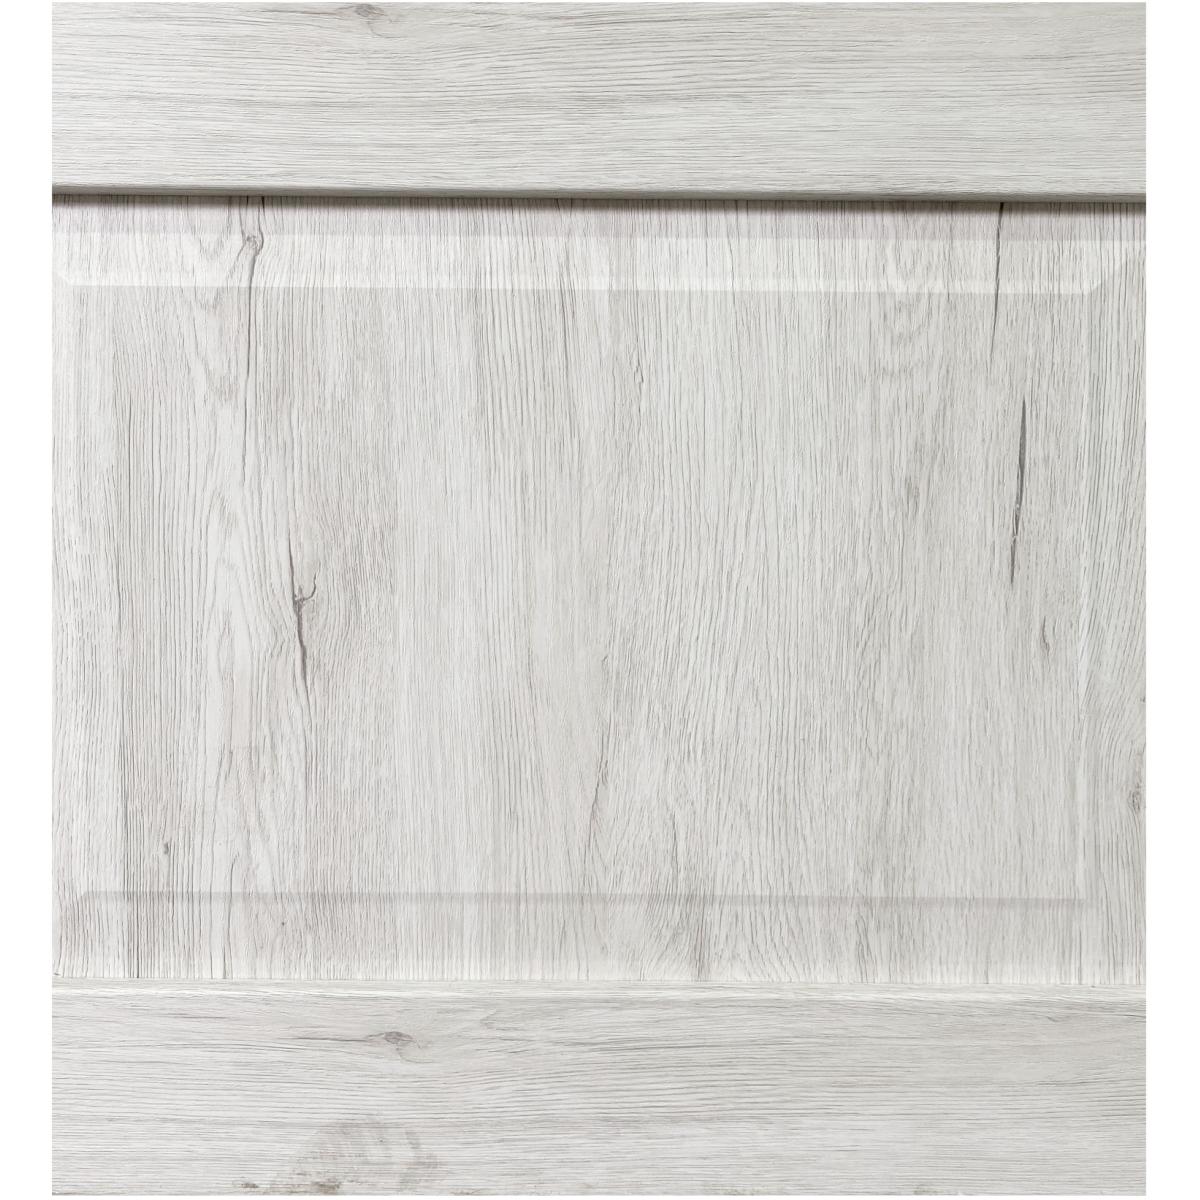 Дверь Межкомнатная Остеклённая Амелия 80Х200 С Фурнитурой Пвх Цвет Рустик Серый